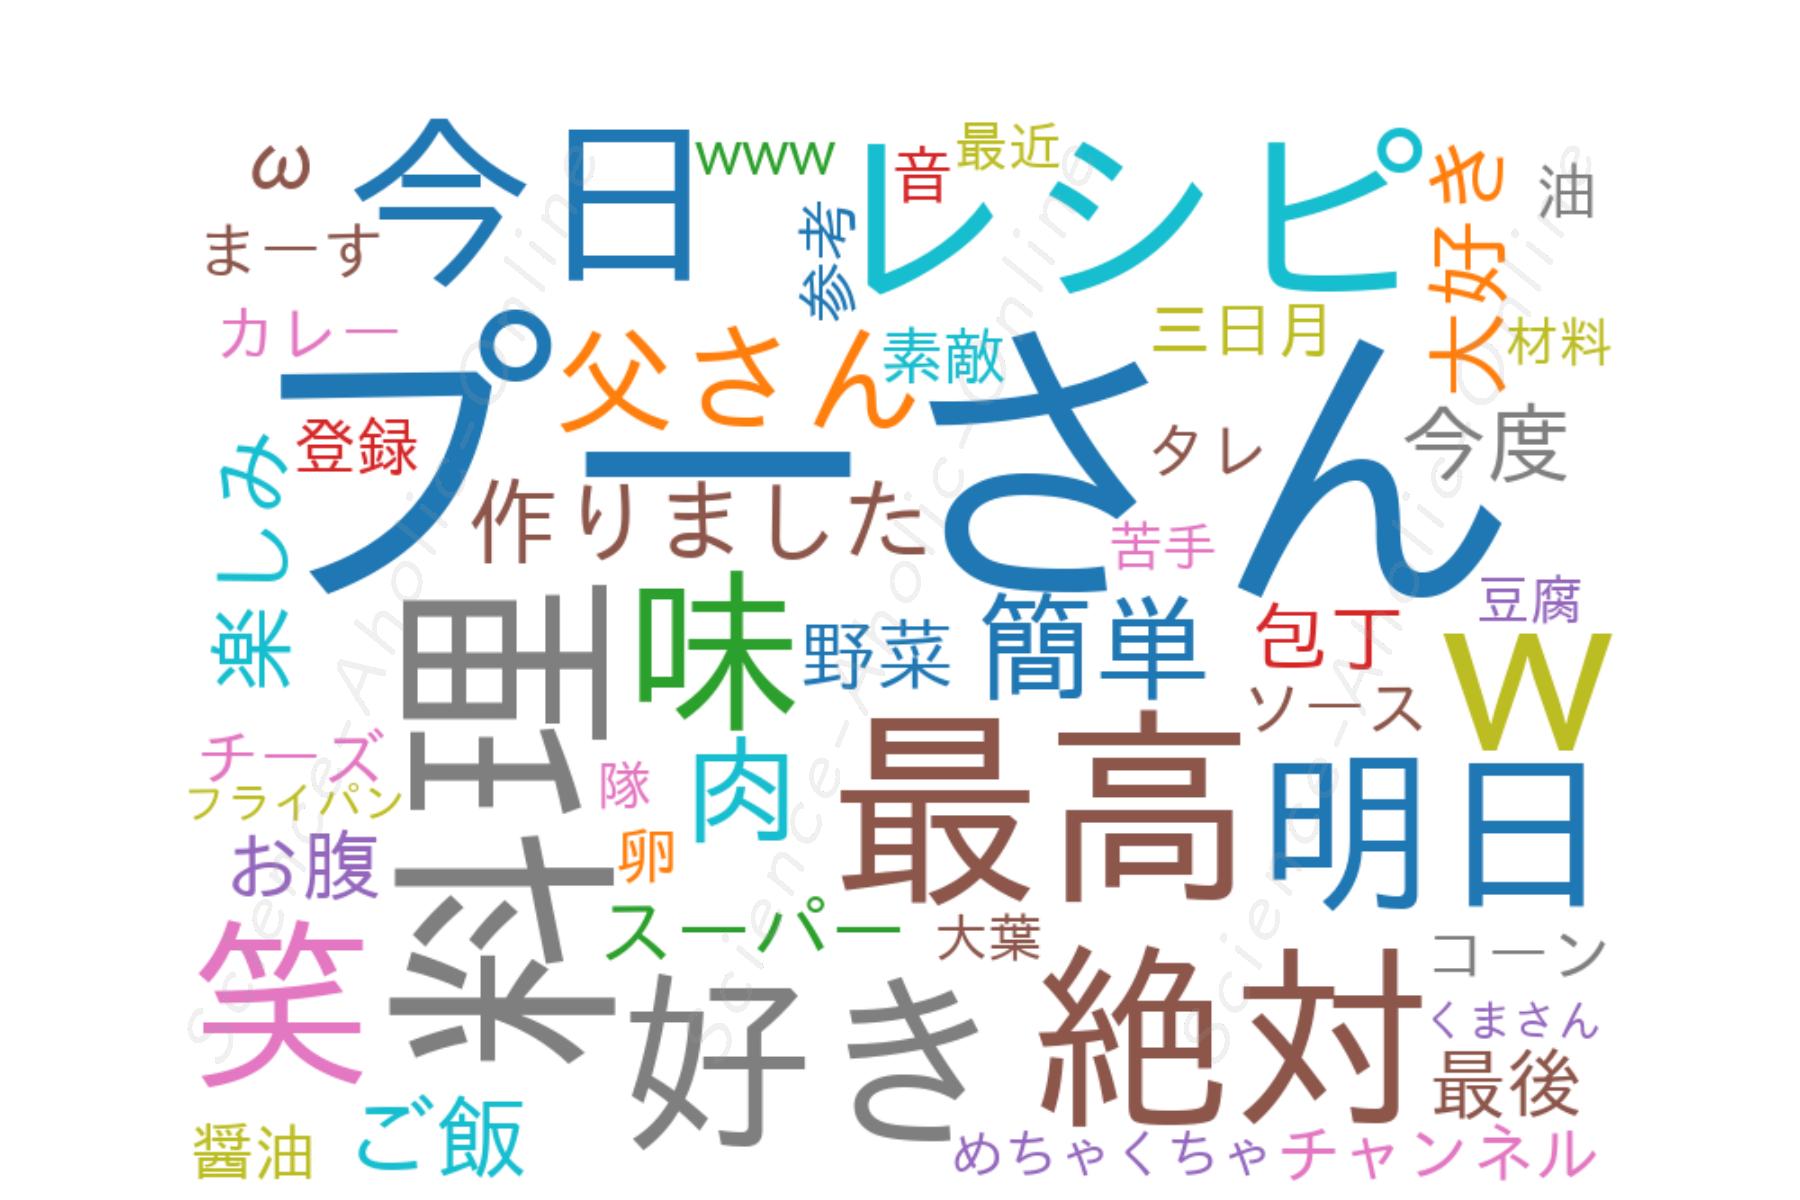 https://science-aholic-online.com/wp-content/uploads/2020/08/wordcloud_くまの限界食堂.png